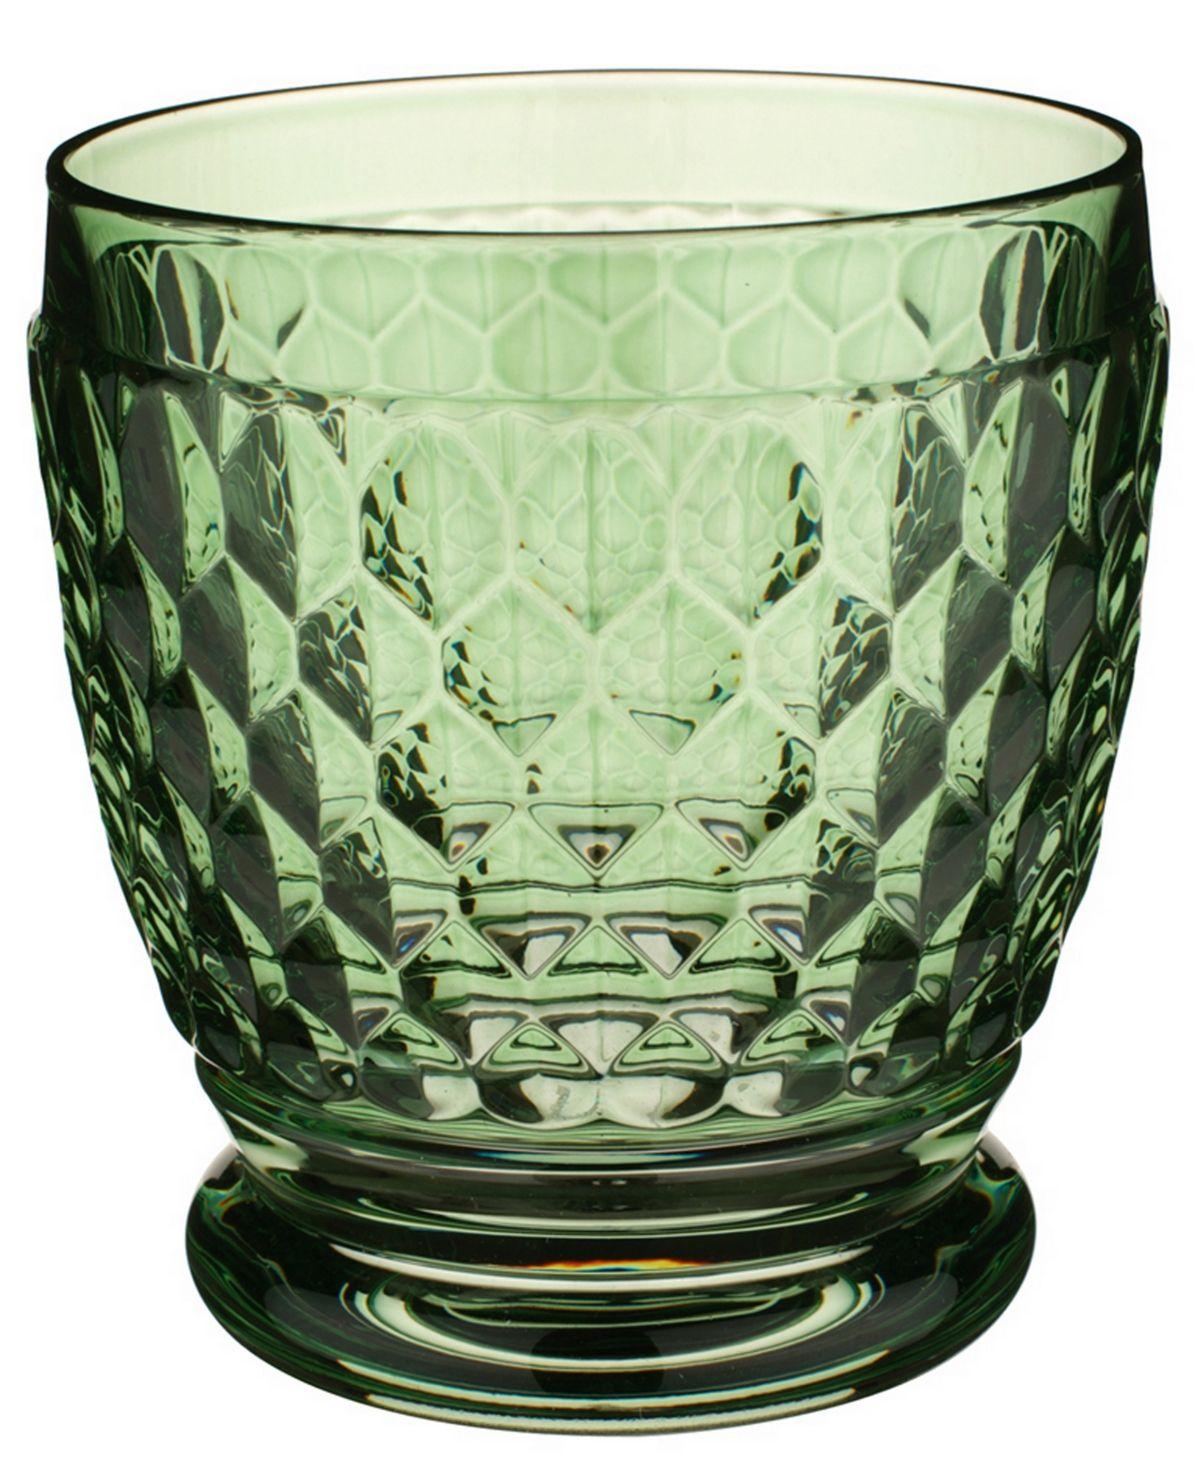 Boston Water Glass Villeroy Boch: Villeroy & Boch Drinkware, Boston Collection & Reviews